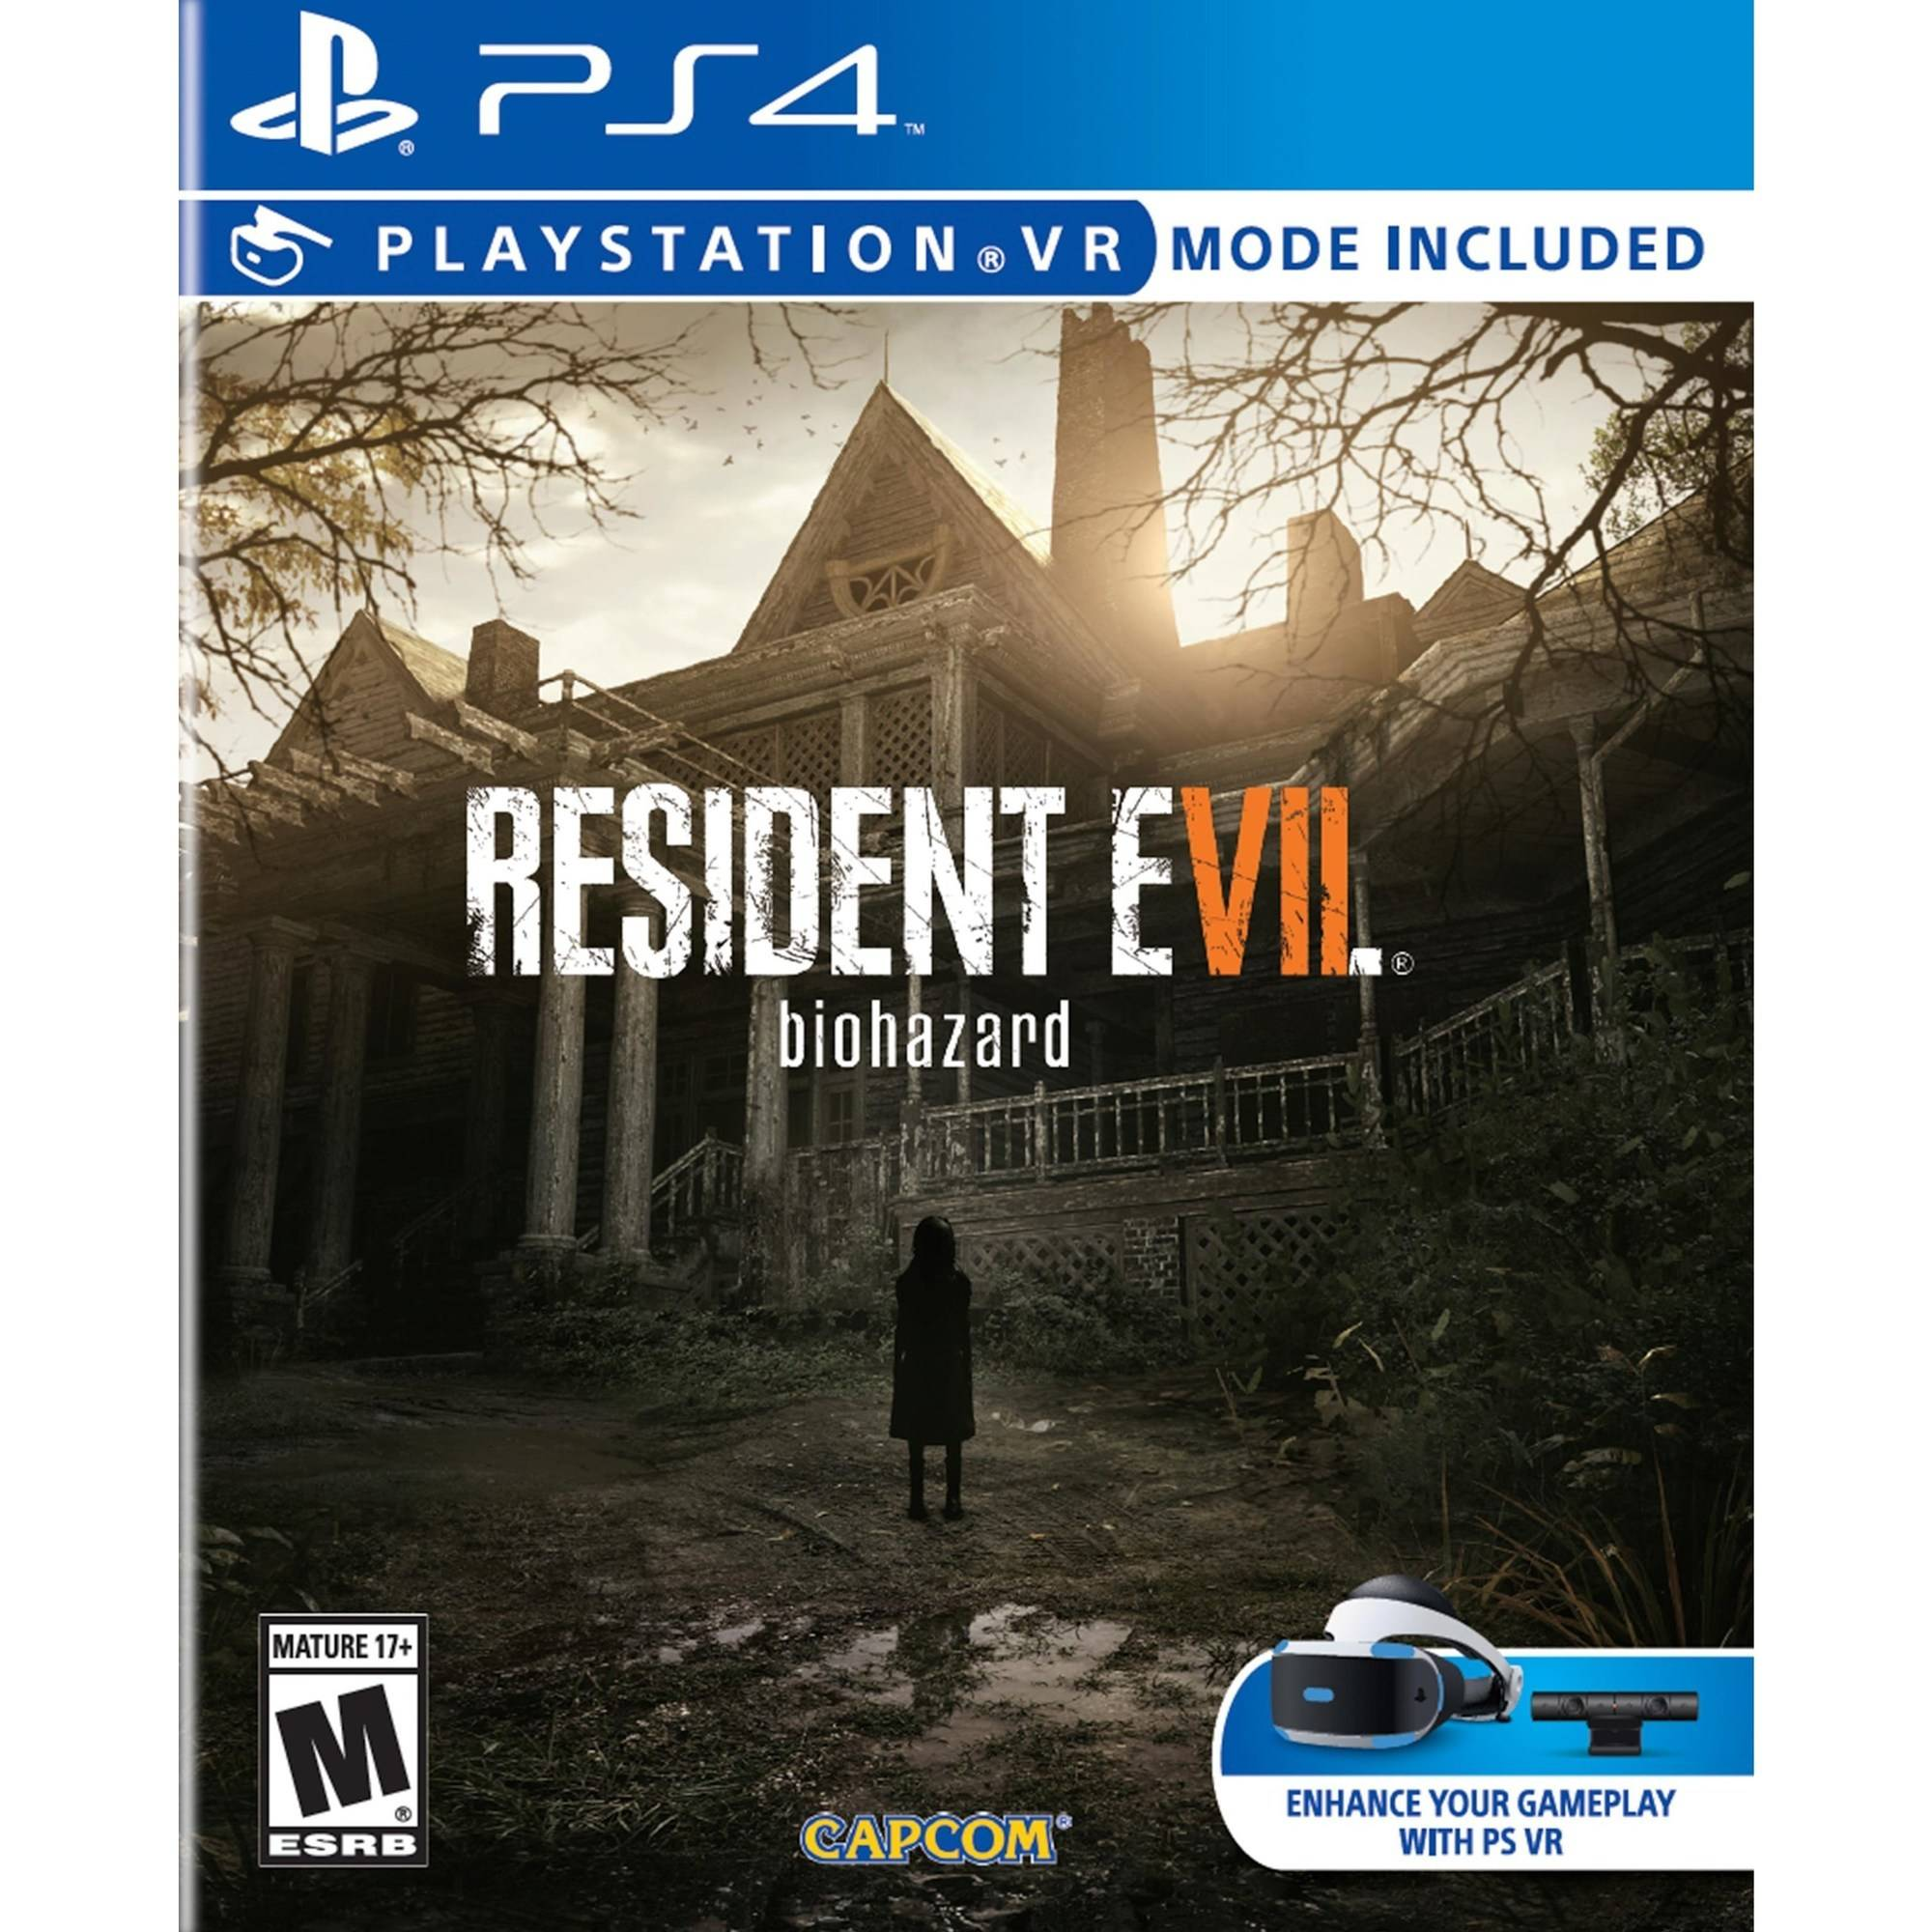 Resident Evil 8 Listed For PS4 By Retailer Leak | Screen Rant